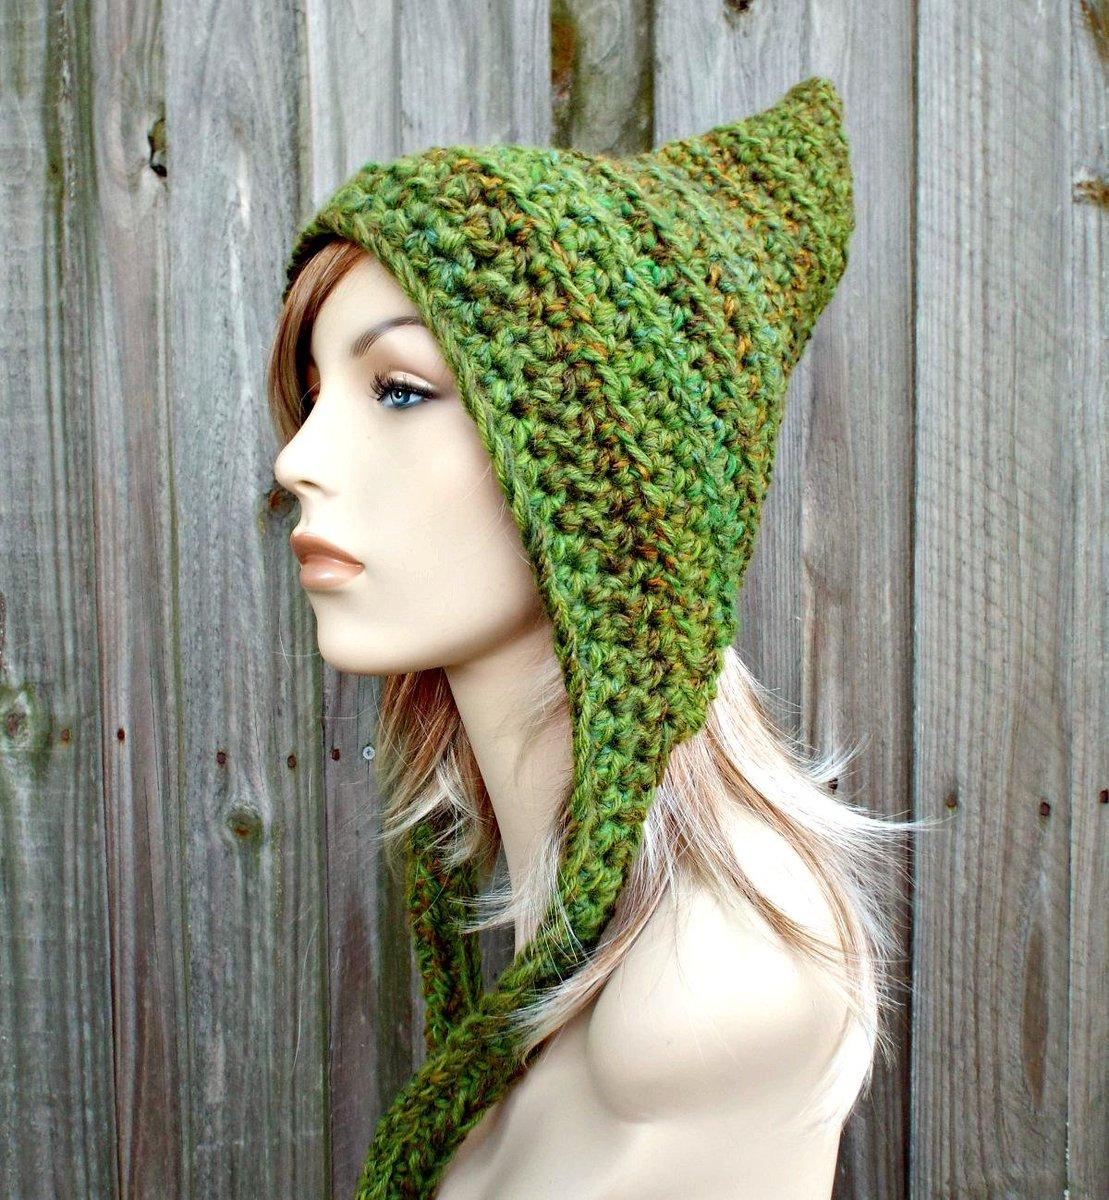 Crocheted Hat Womens Hat - Oversized Crocheted Pixie Hat in Mixed Gre… https://t.co/vbX8TVitHn #pixiebell #Pixiebell https://t.co/7b8ZJWprkZ